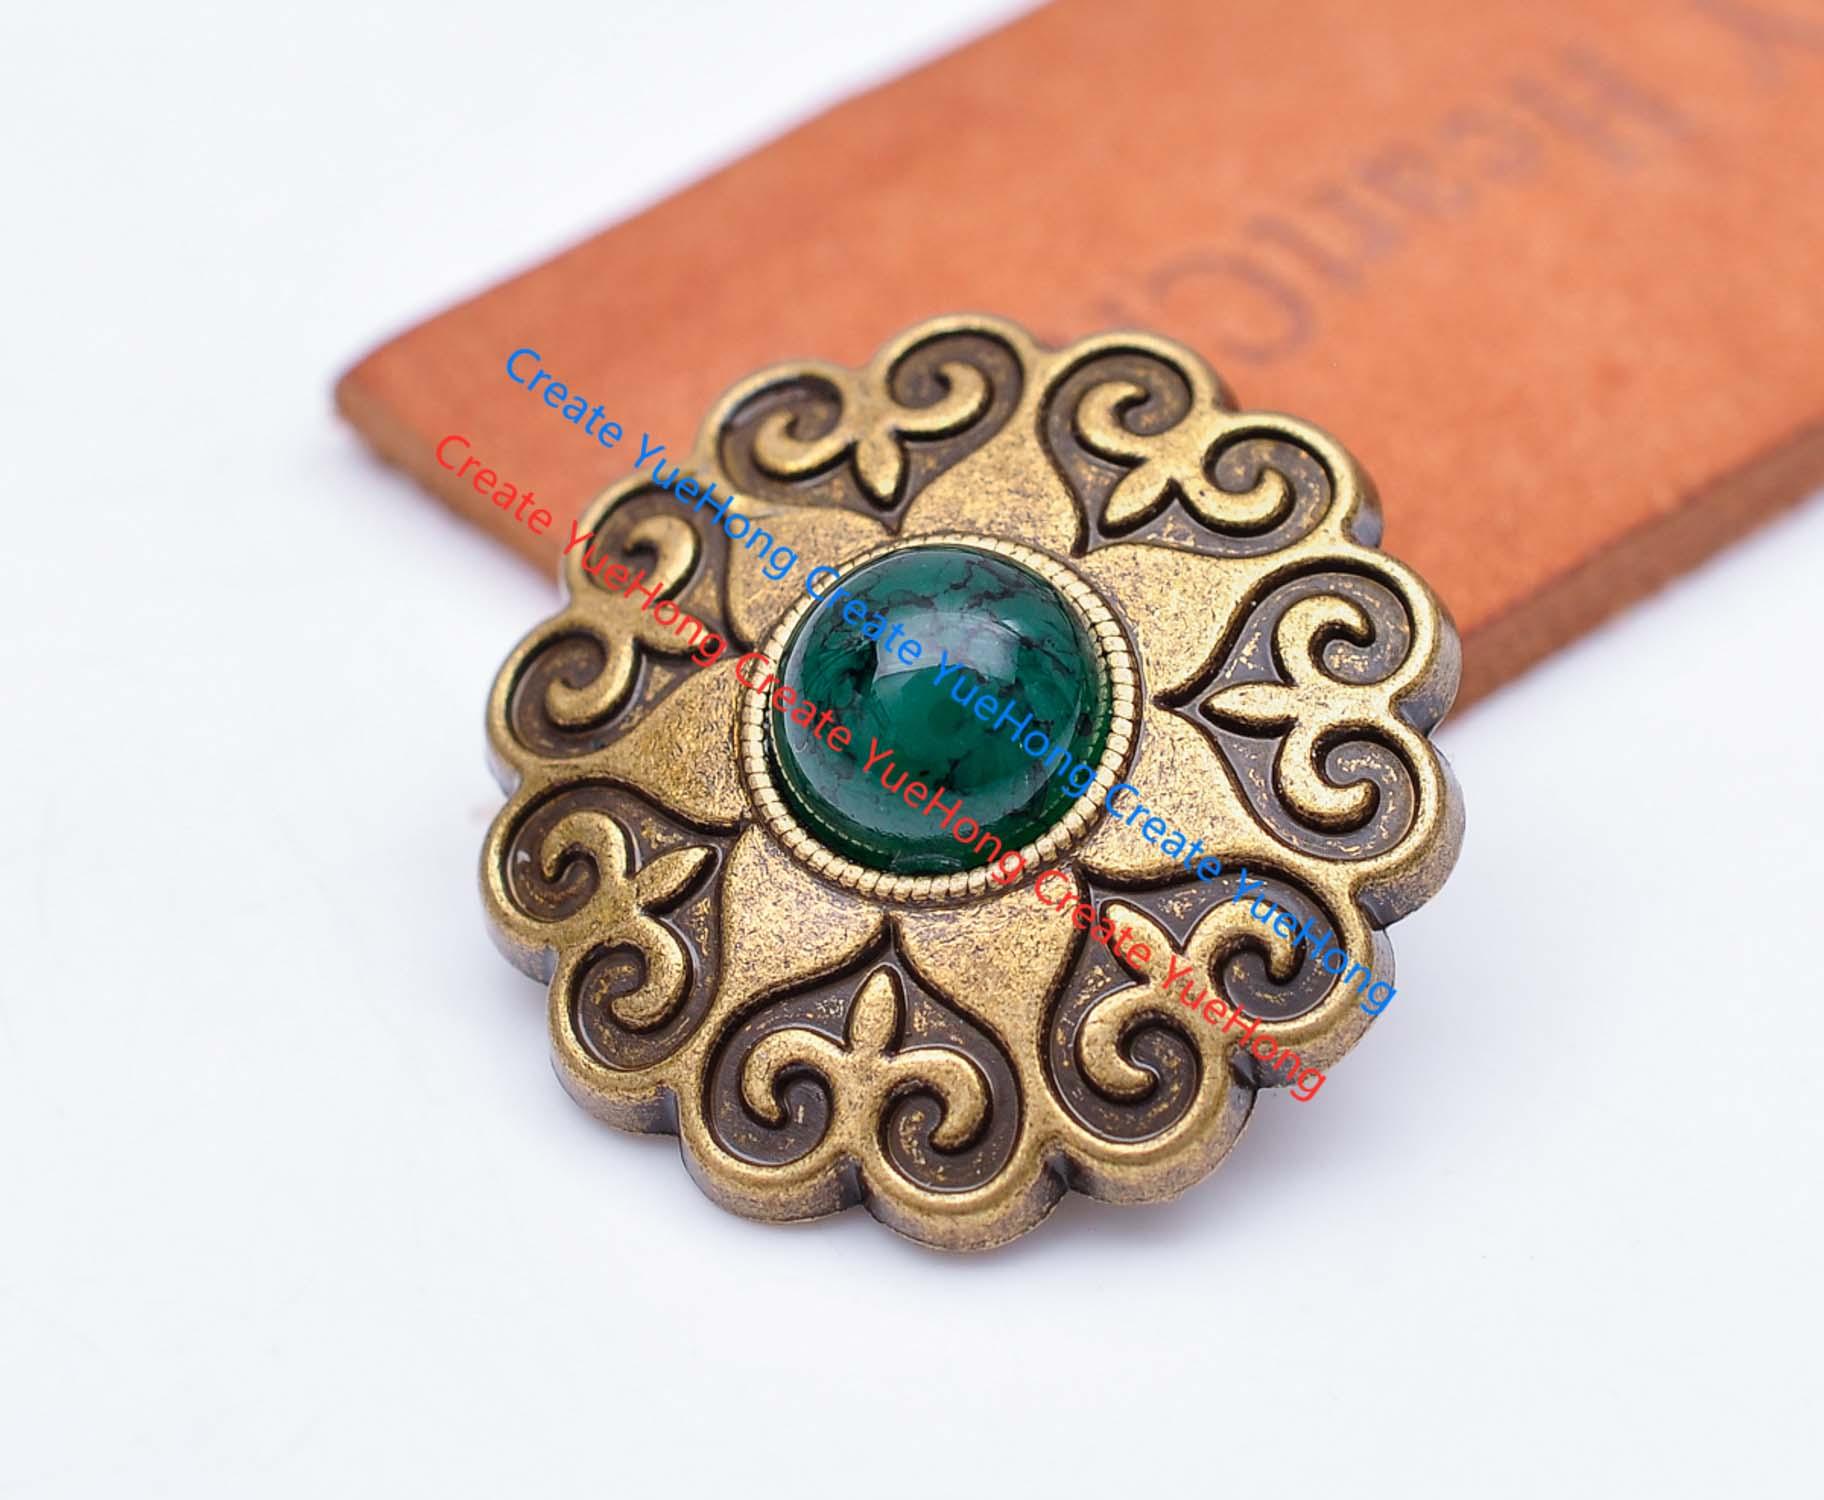 10X29 MM antiguo latón vaquero Biker celta flor tallada abalorios de piedra verde artesanía cuero cinturón sillín Concho insignia